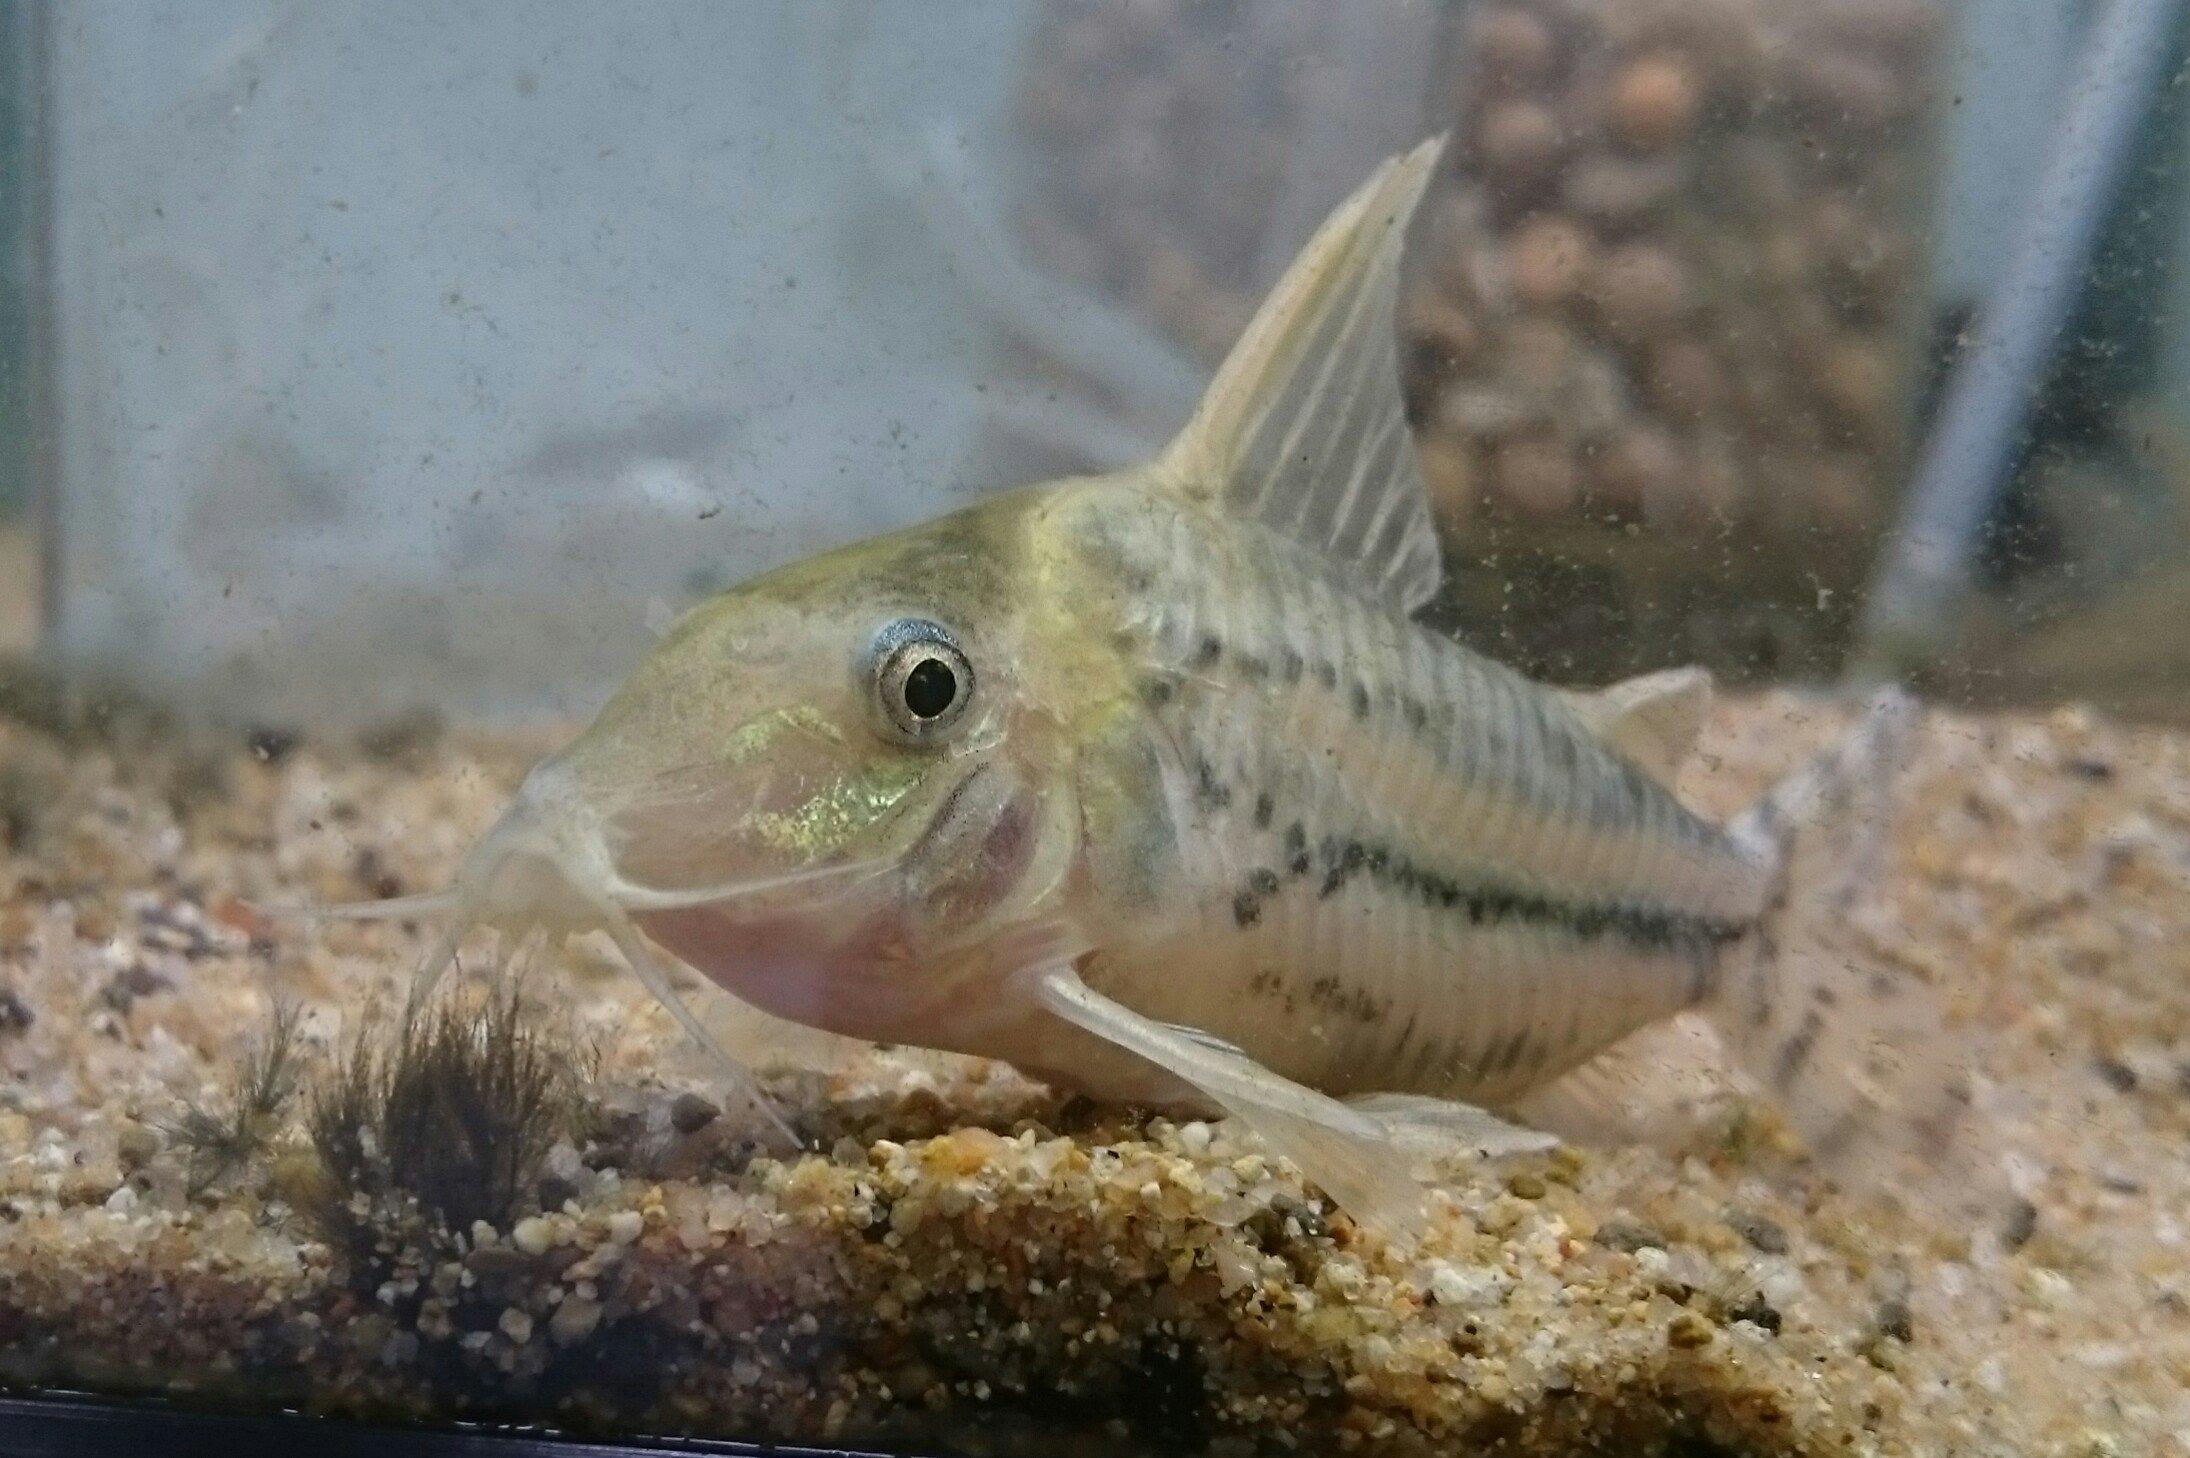 2017年熱帯魚入荷情報!Vol.13 速報!今週のTOKYO遠征便!_b0141806_04463442.jpg